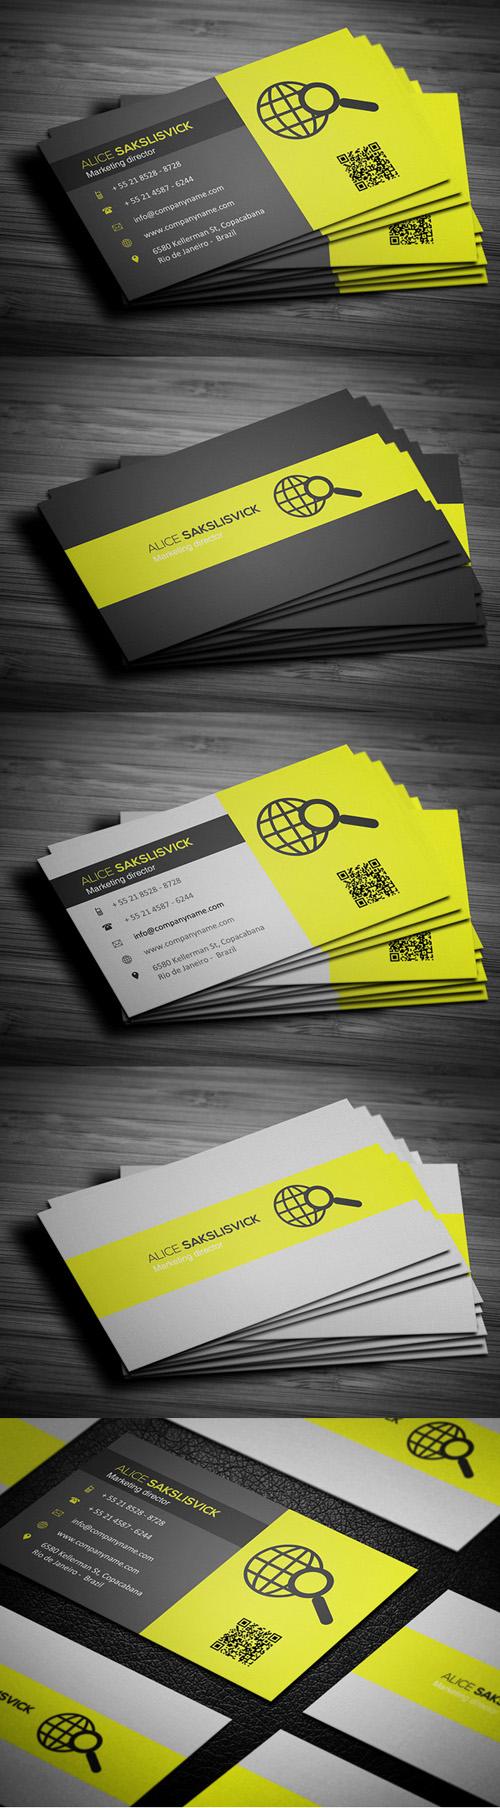 1. Corporate Business Card